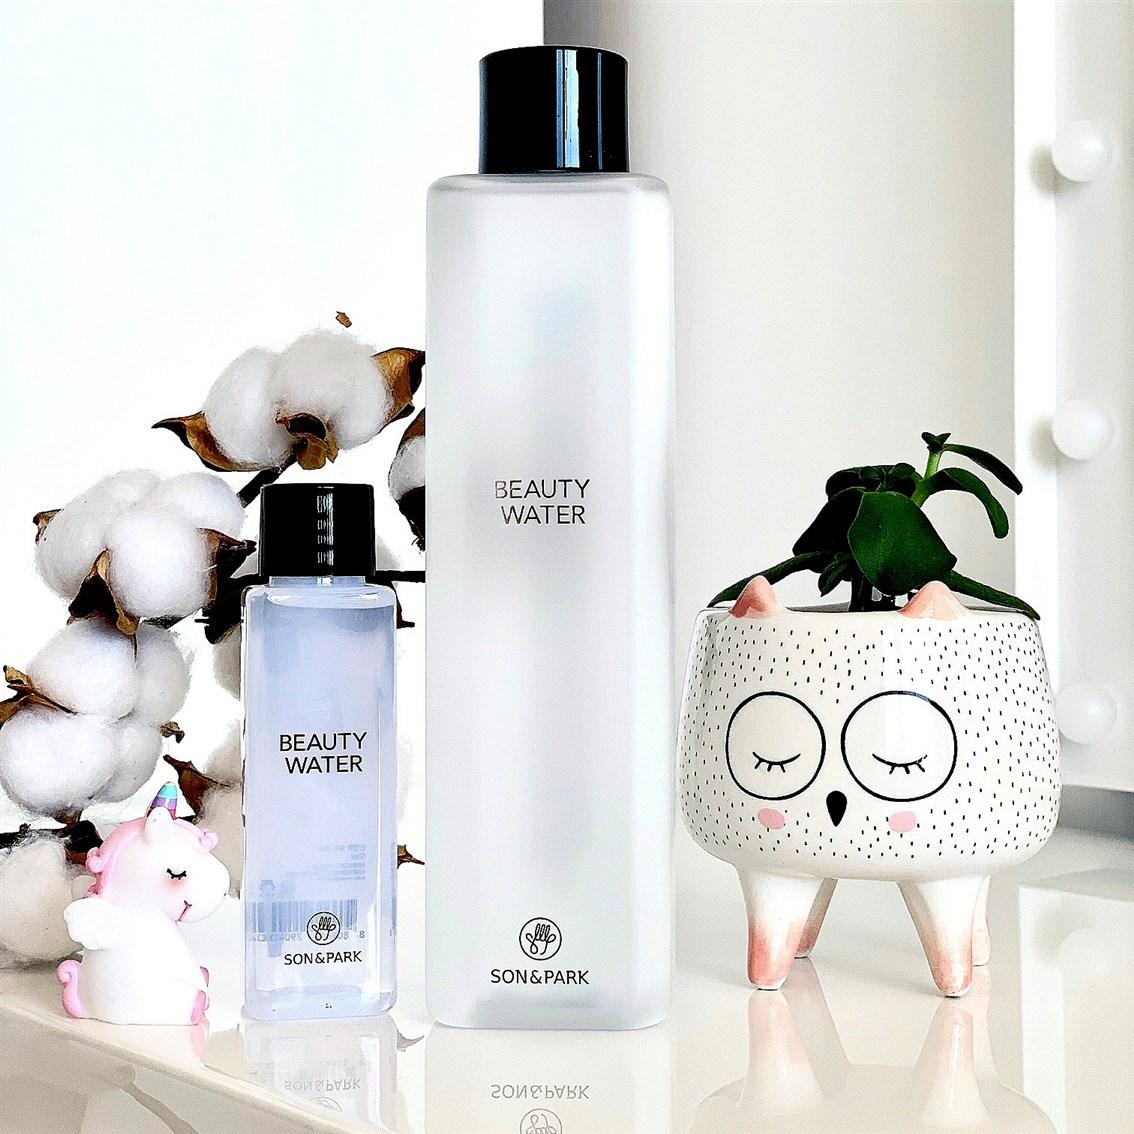 Son & Park Beauty Water recenzja opinie